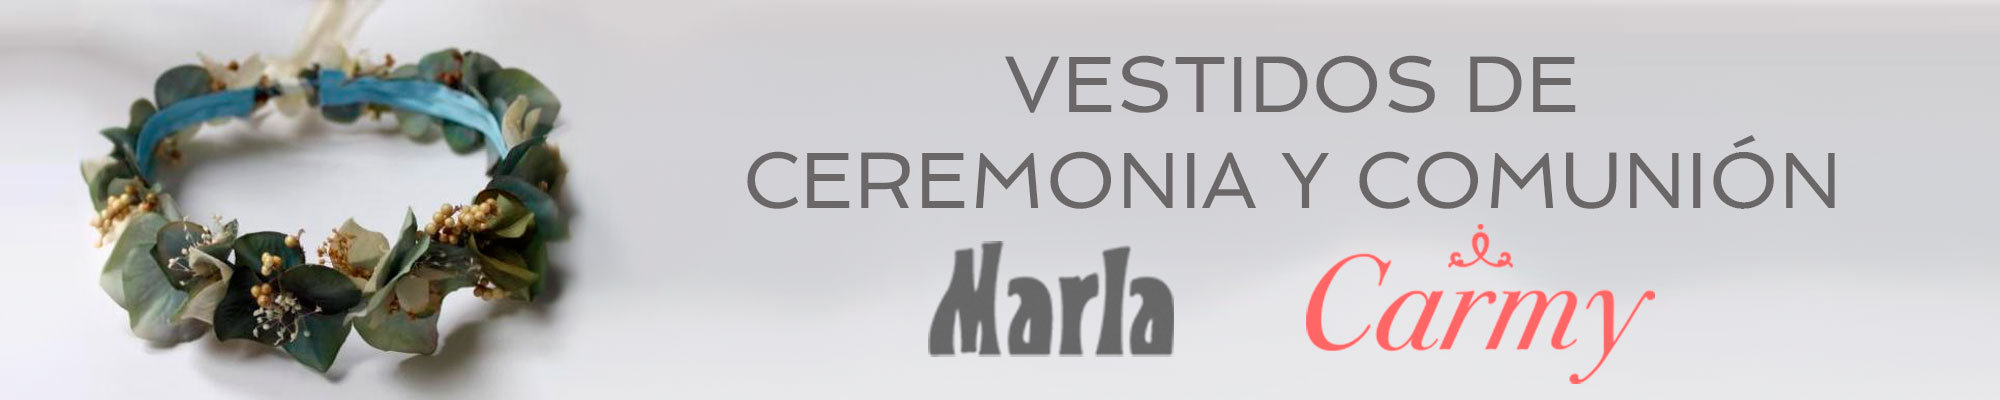 Vestidos comunion Marla y Carmy - Moda Infantil Maricarmen